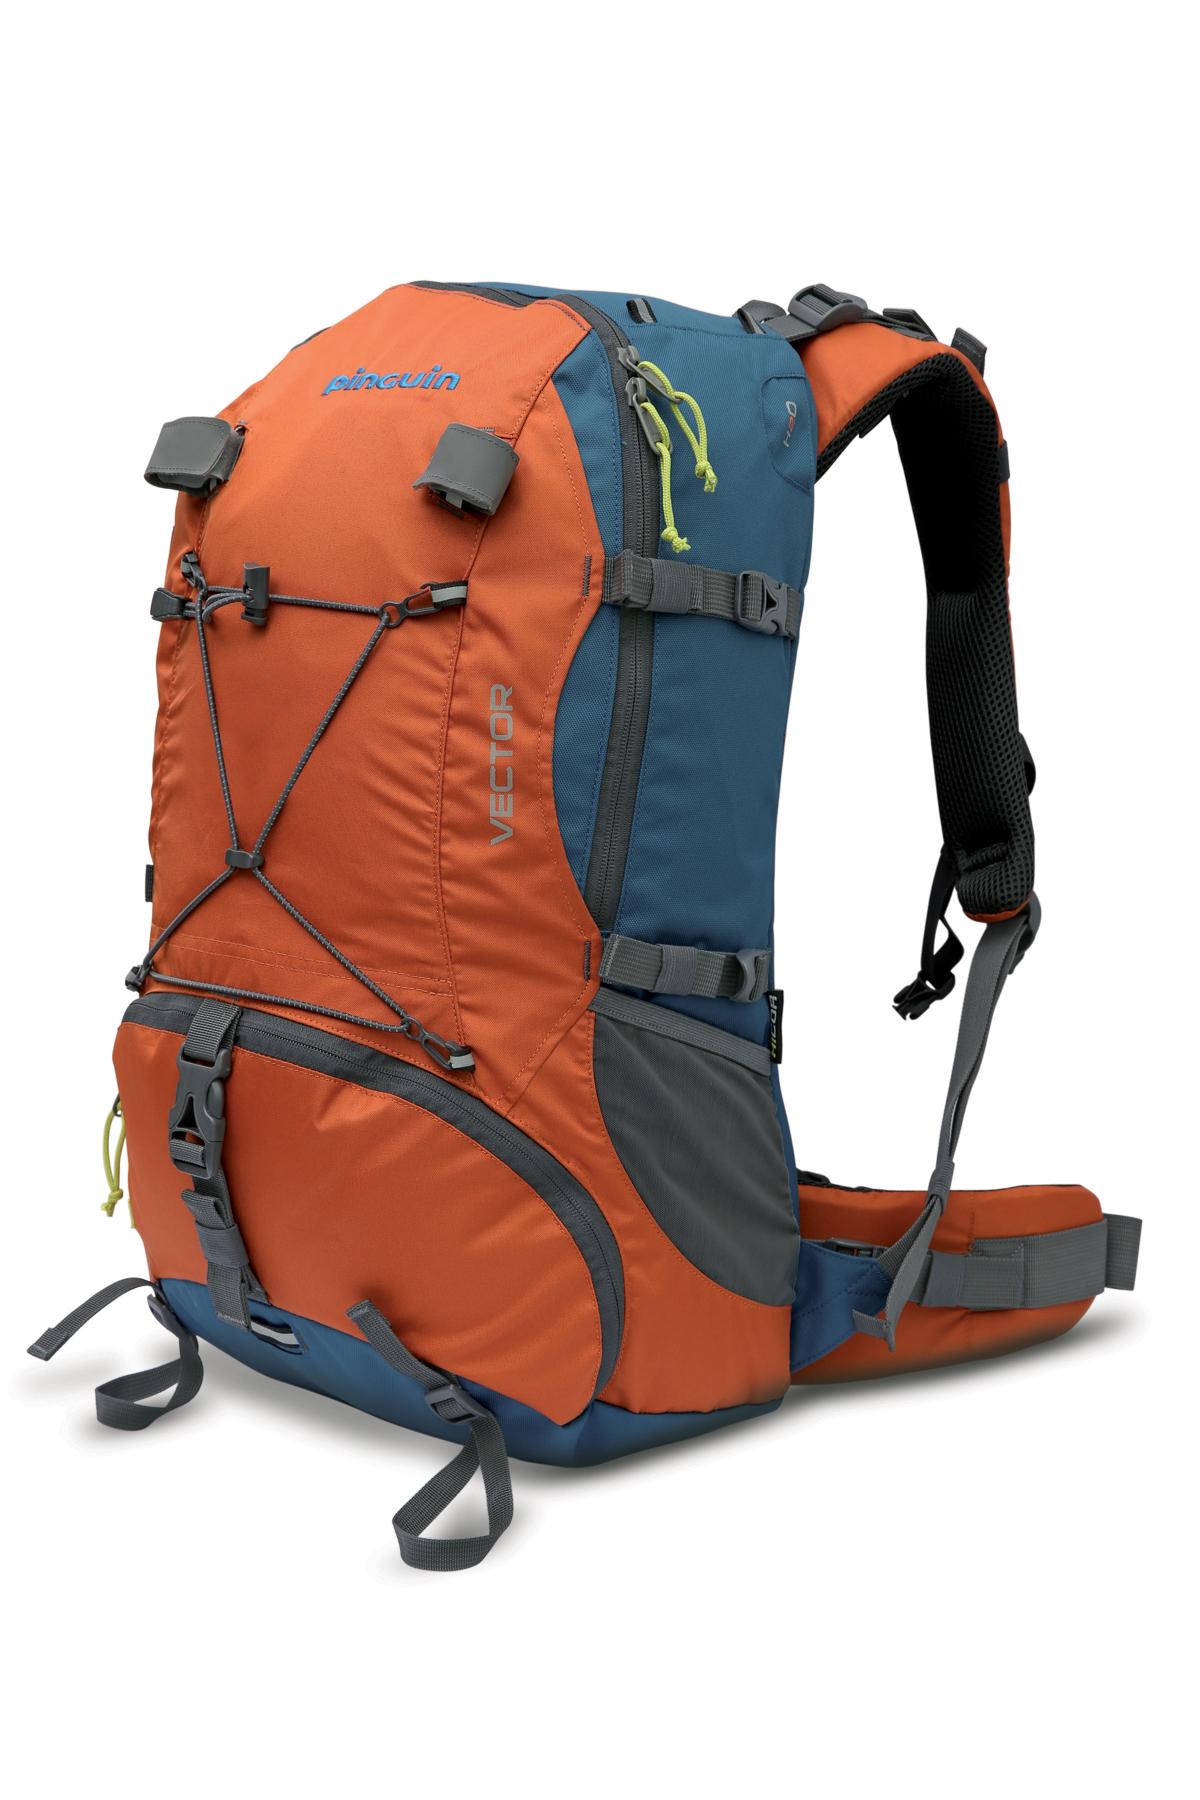 37a1040bdc Pinguin - Backpacks - Vector 35